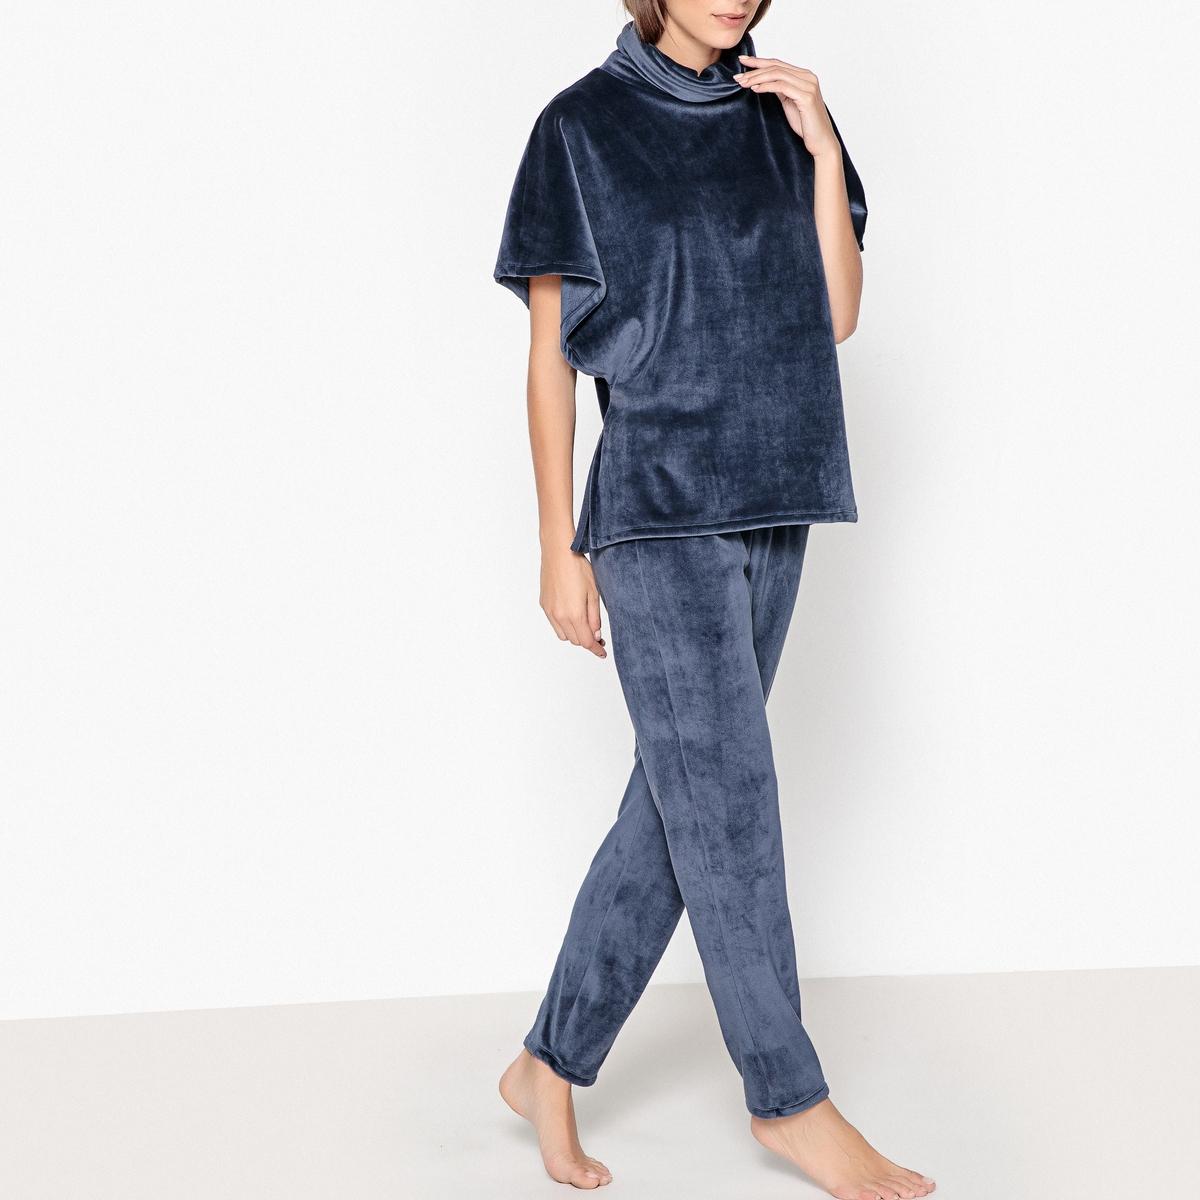 Pijama muito suave